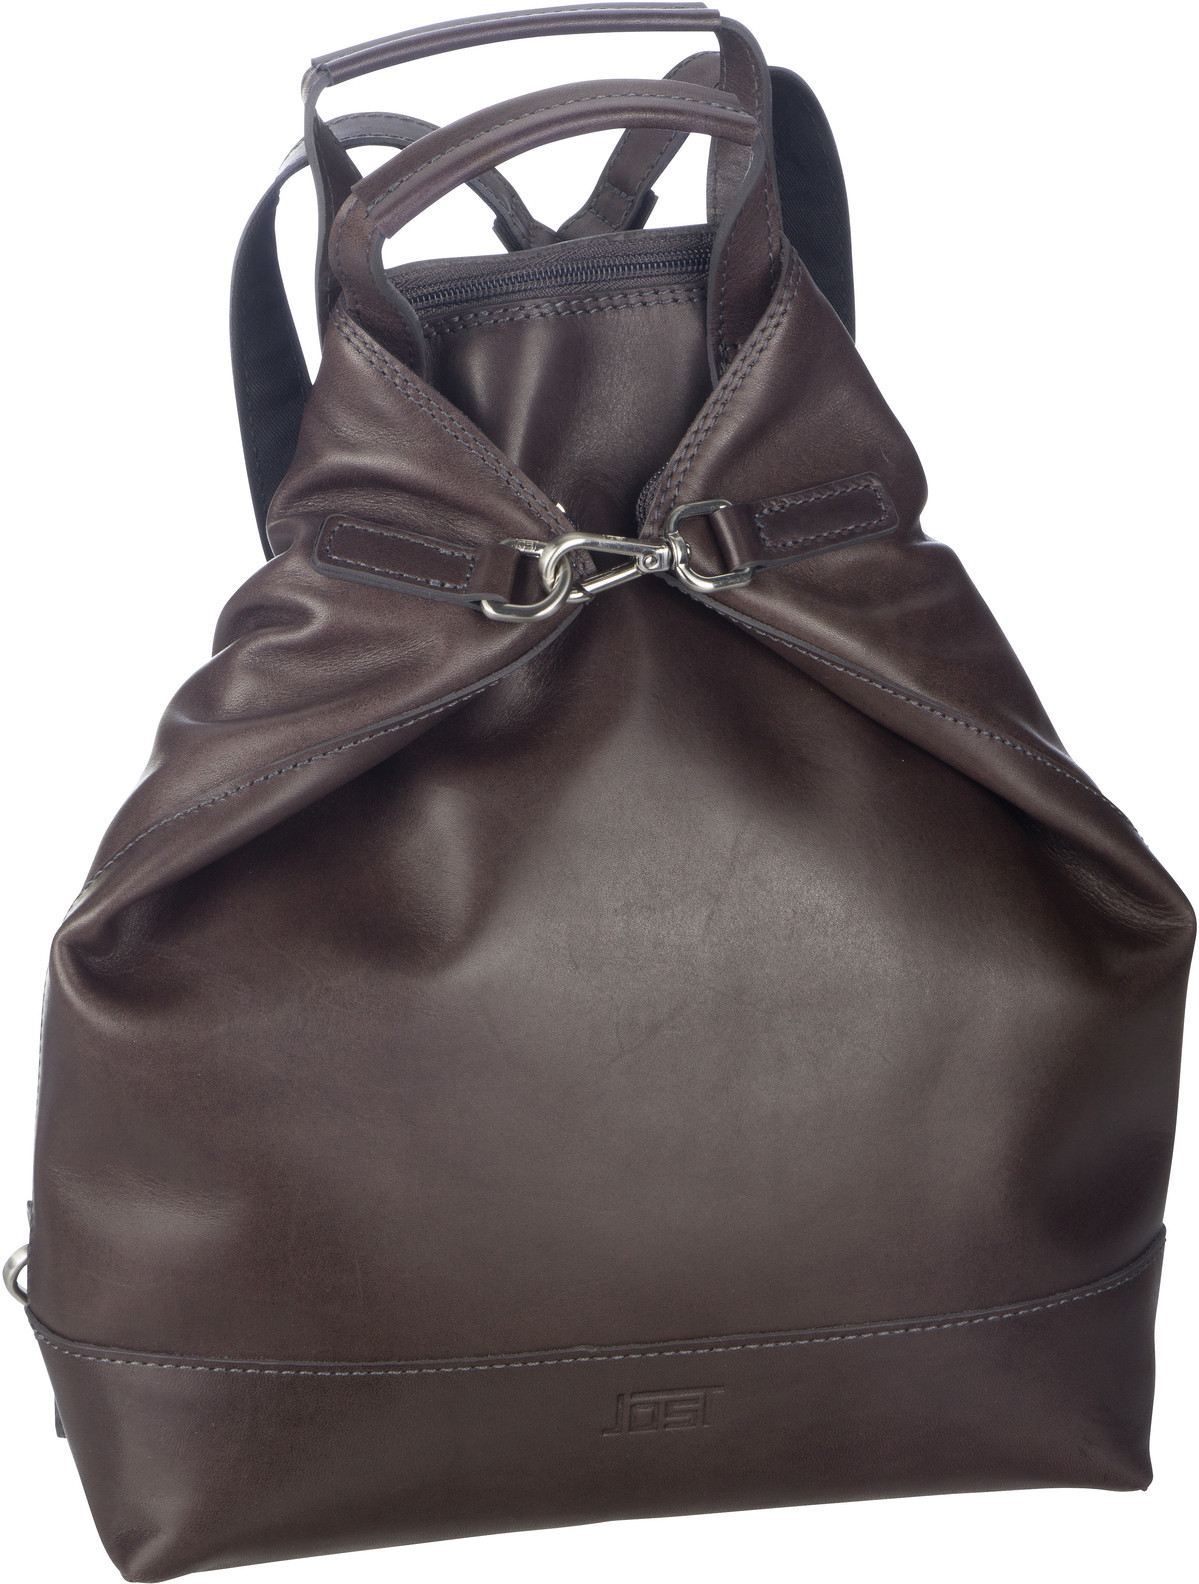 Rucksack / Daypack Rana 1206 X-Change Bag XS Grey